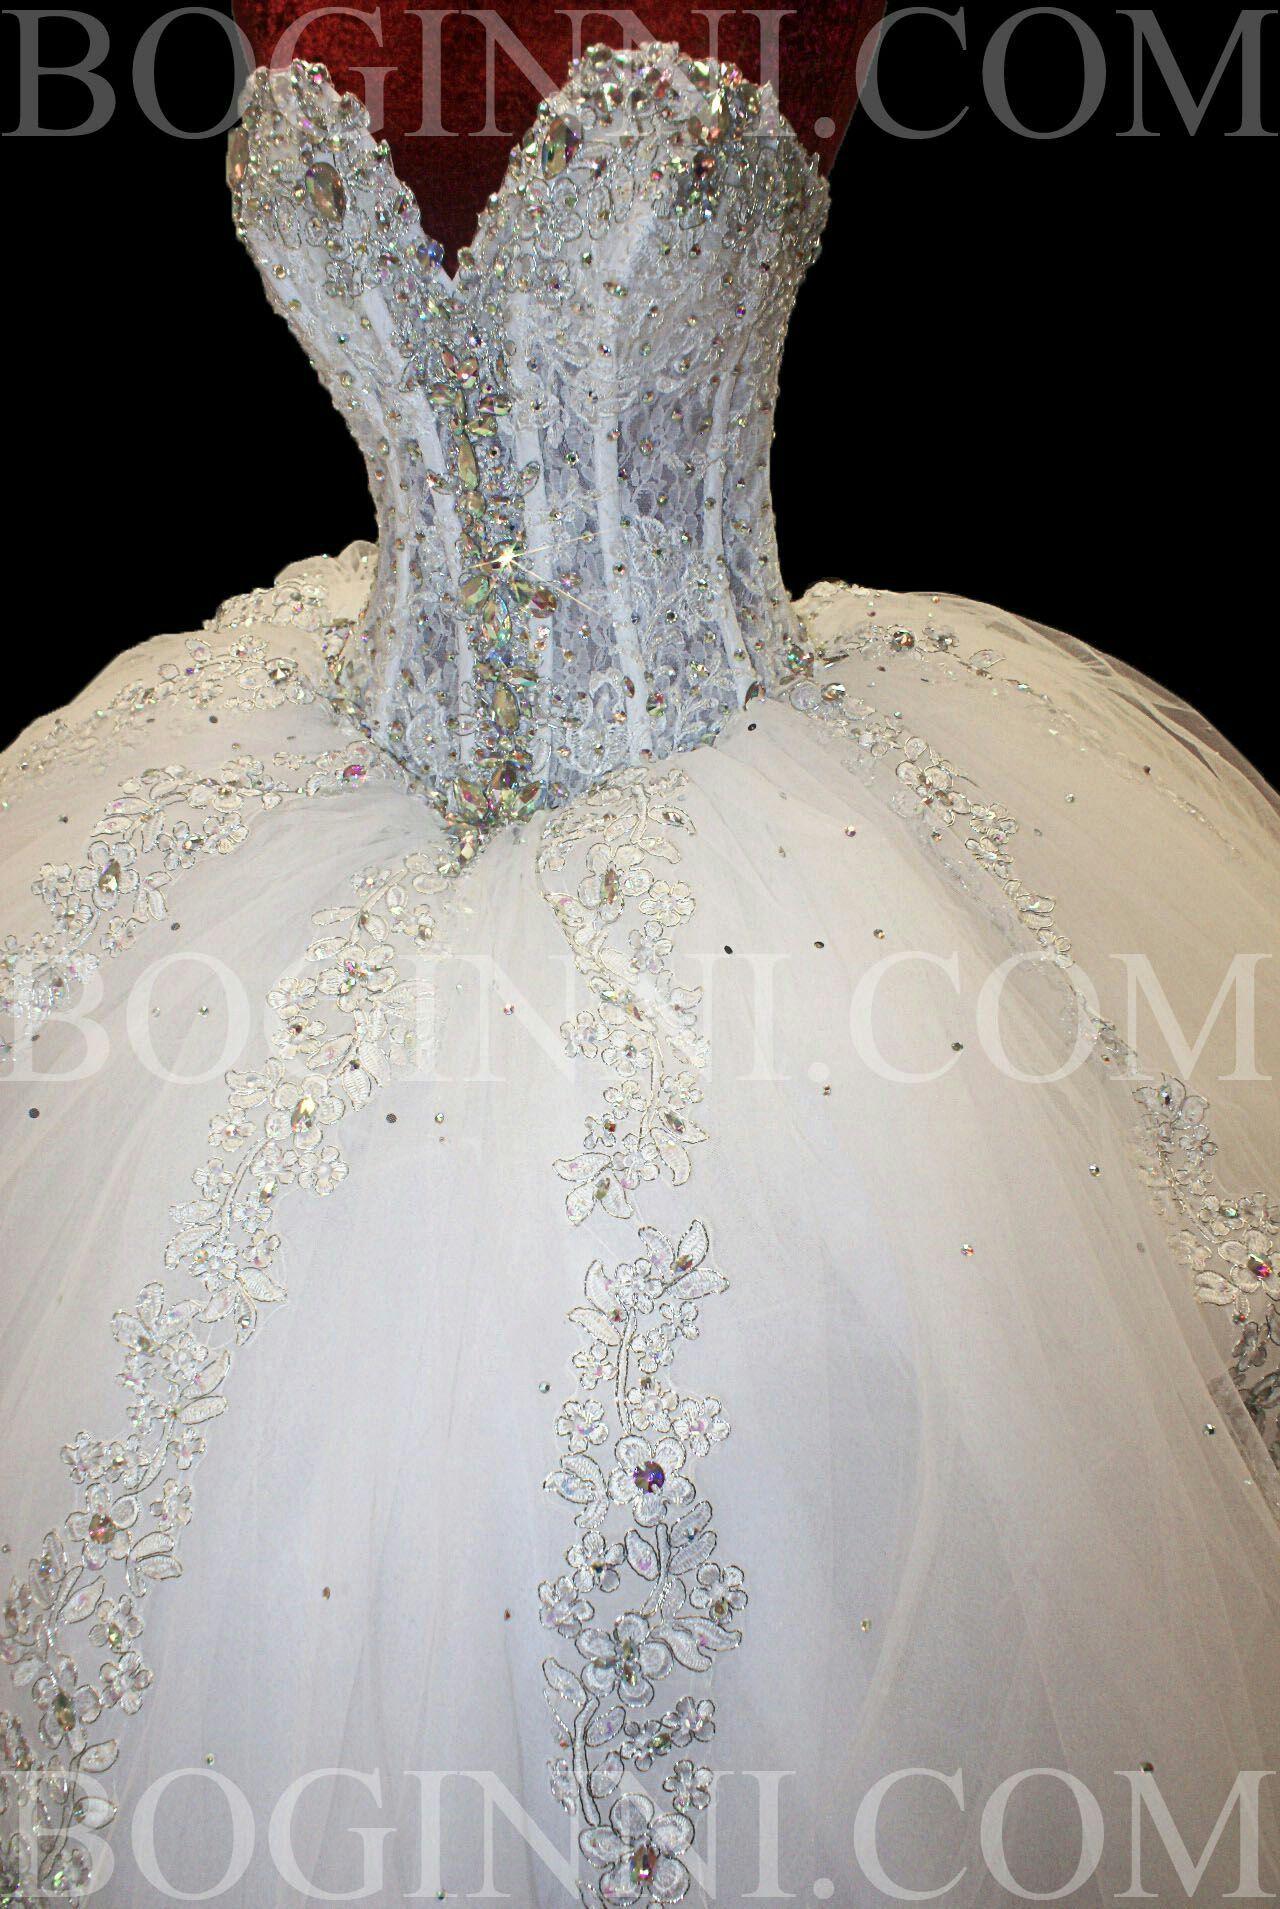 Pin by Meagan Johnson-Slipka on Wedding | Pinterest | Wedding ...